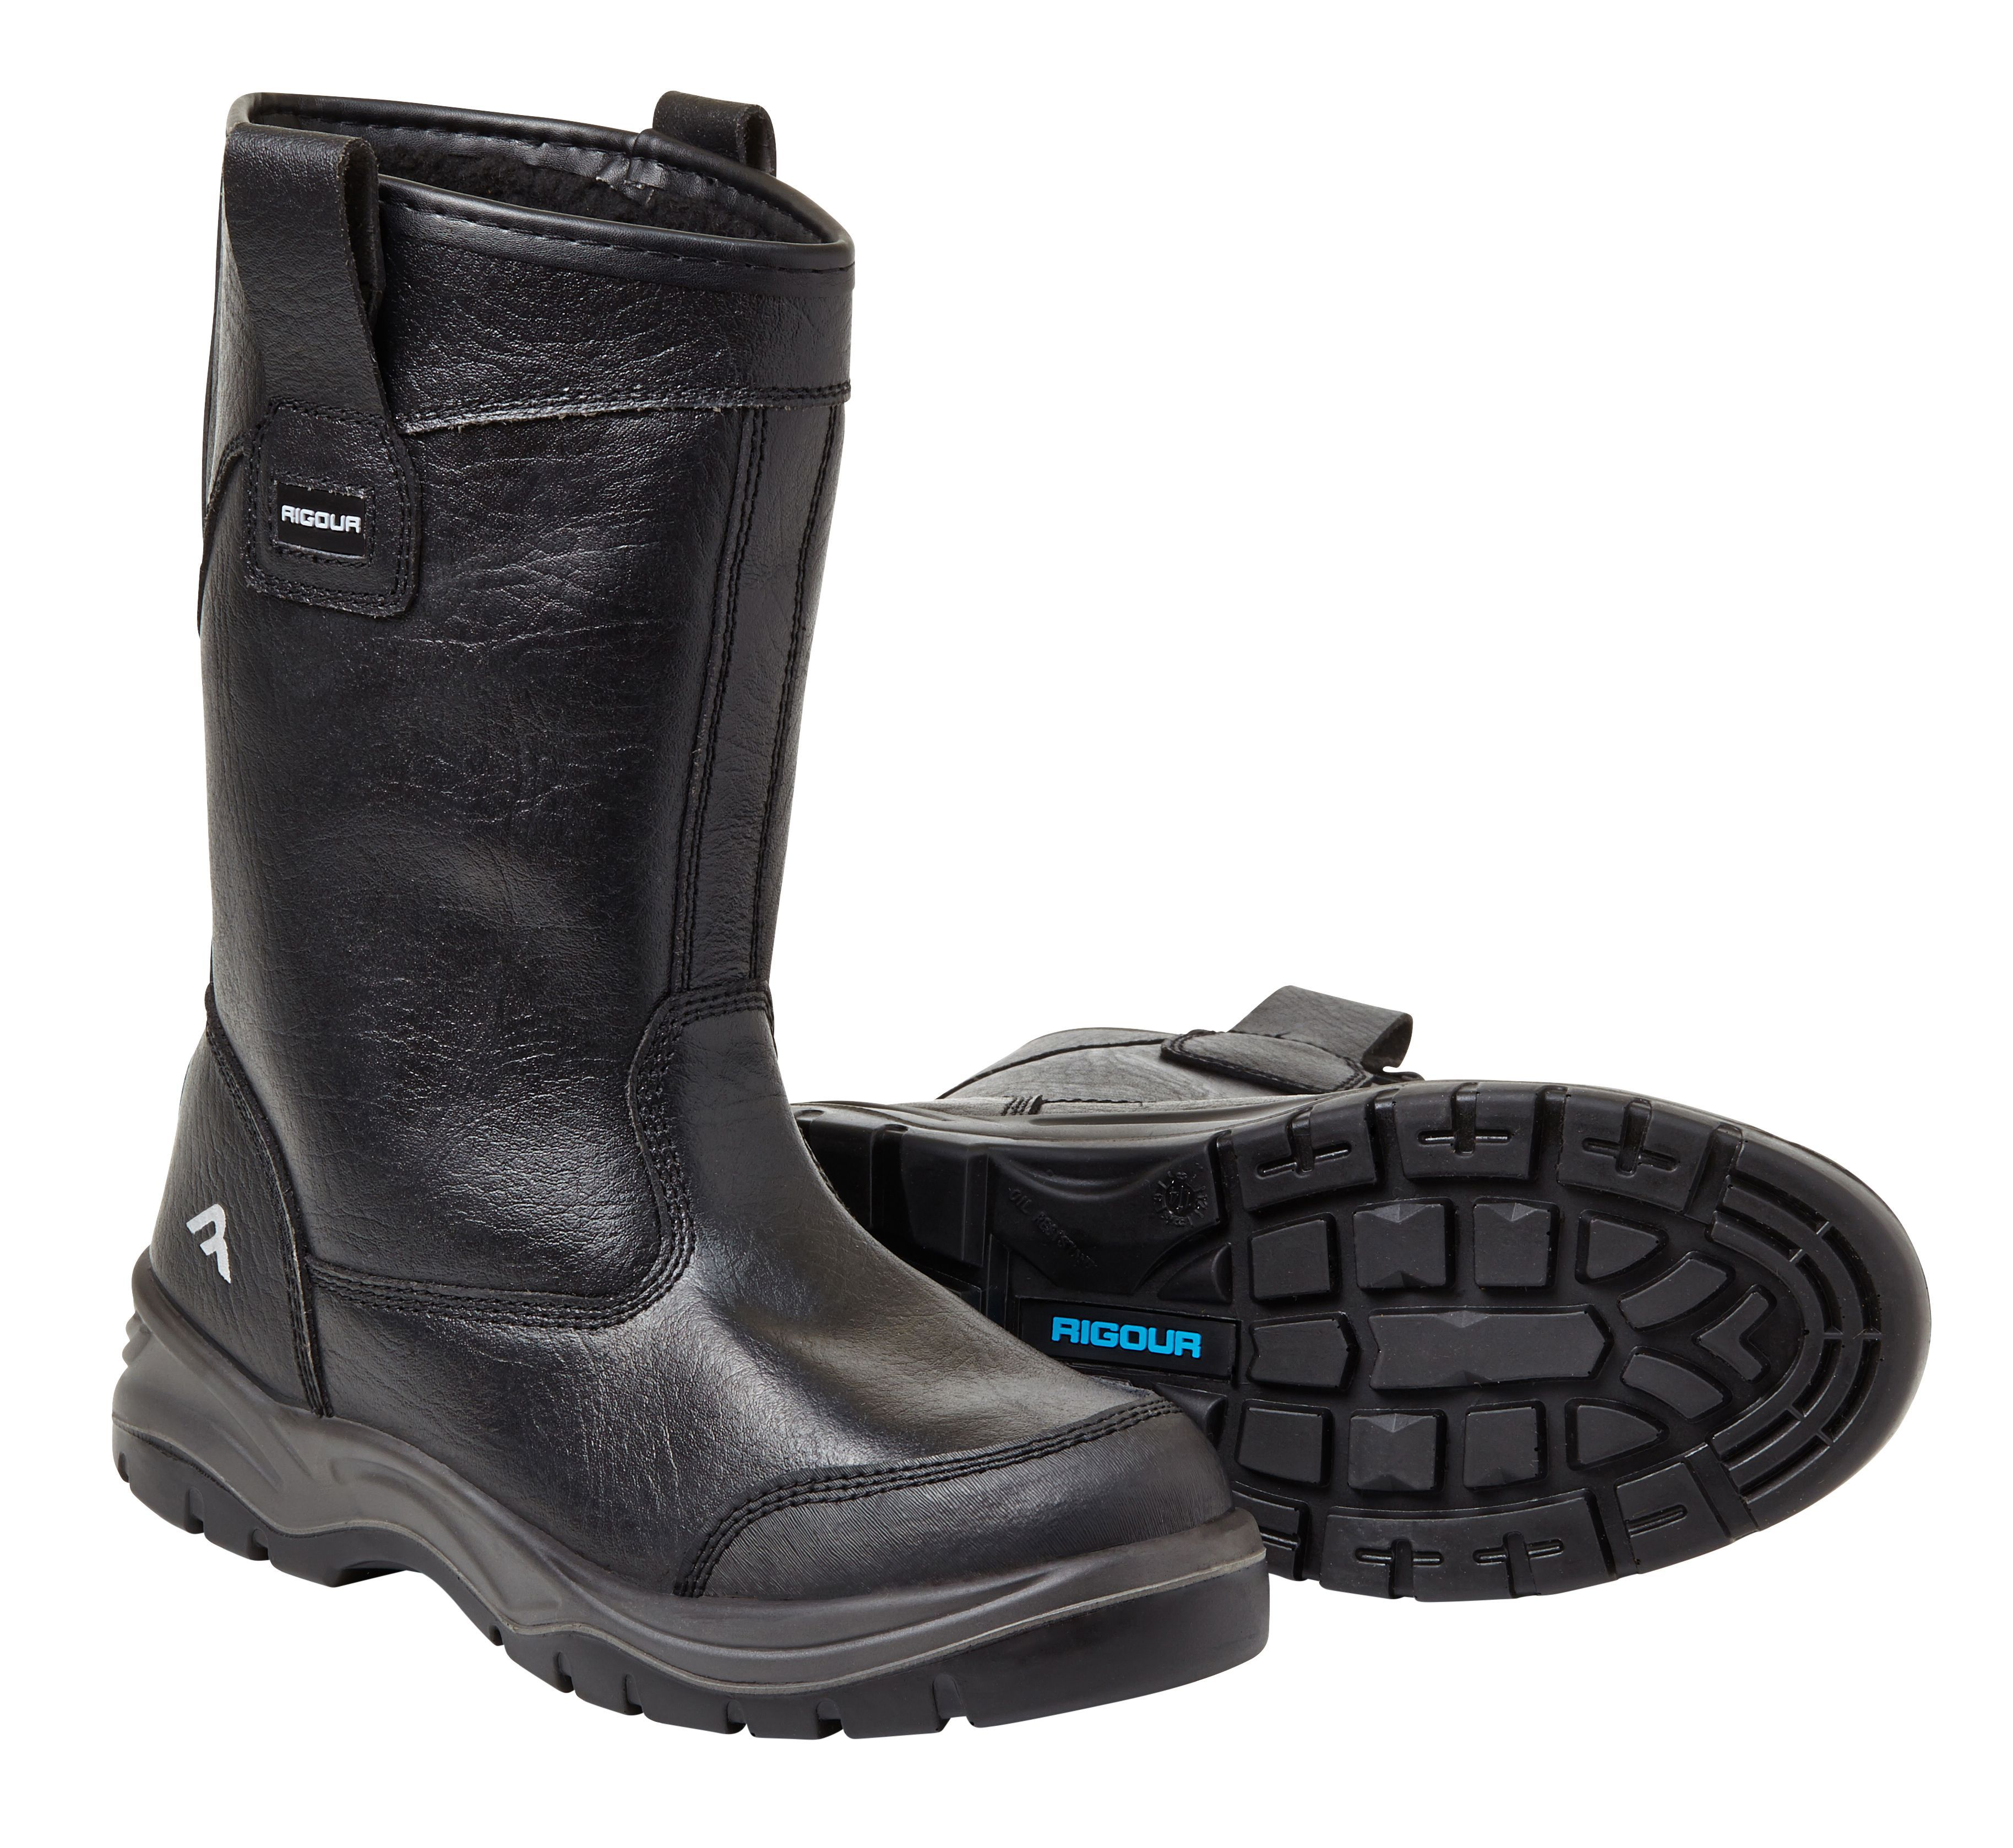 Rigour Black Rigger Boots, Size 12